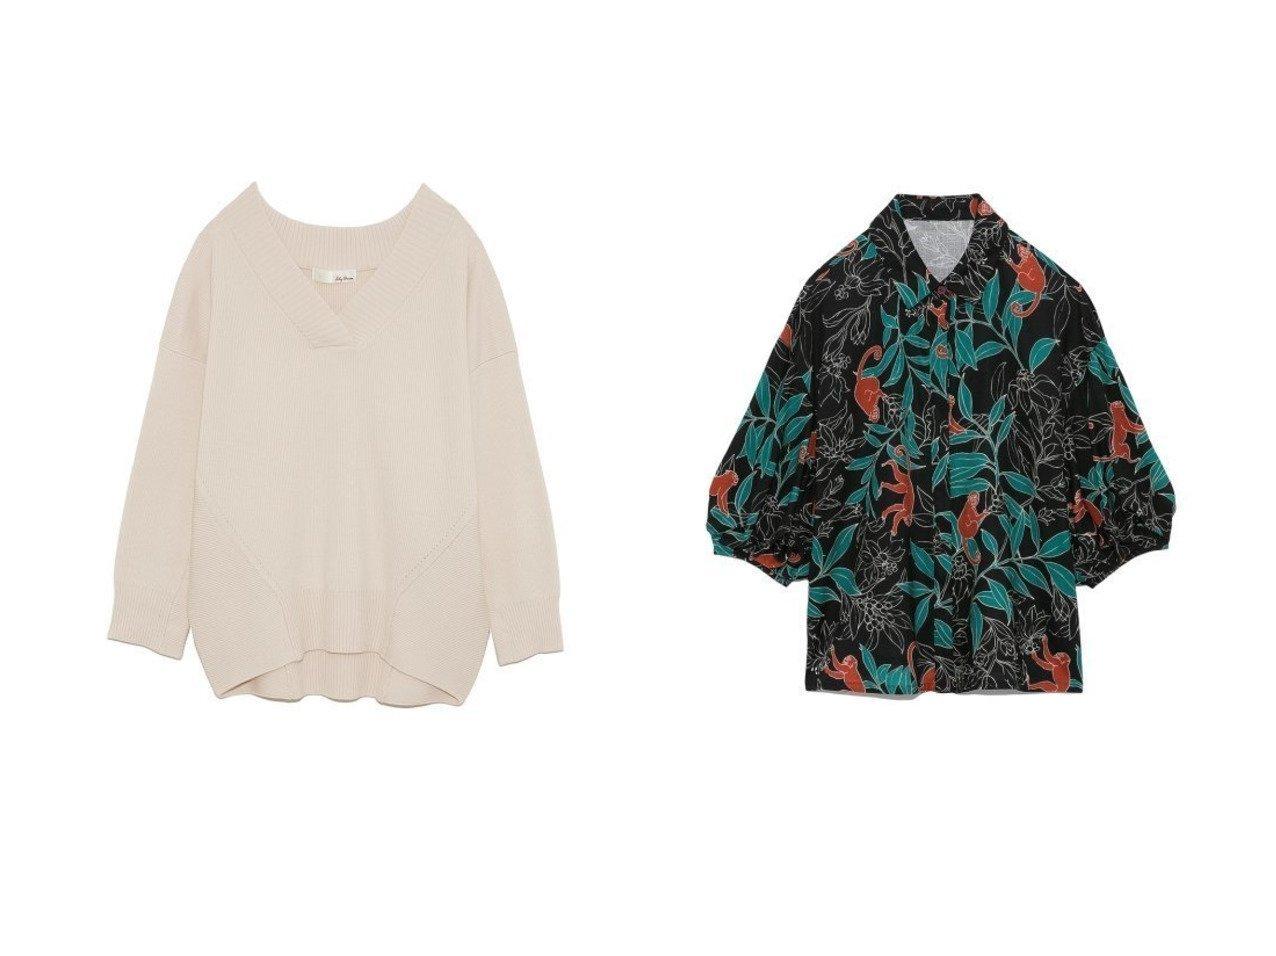 【Lily Brown/リリーブラウン】のモンキー柄ブラウス&Vネックオーバーニットプル Lily Brownのおすすめ!人気、トレンド・レディースファッションの通販 おすすめで人気の流行・トレンド、ファッションの通販商品 メンズファッション・キッズファッション・インテリア・家具・レディースファッション・服の通販 founy(ファニー) https://founy.com/ ファッション Fashion レディースファッション WOMEN トップス Tops Tshirt ニット Knit Tops Vネック V-Neck シャツ/ブラウス Shirts Blouses オフショル オフショルダー 畦 シンプル スマート セットアップ セーター ダブル フォルム ボトム 再入荷 Restock/Back in Stock/Re Arrival ウッド オリエンタル スリーブ バランス バルーン プリント リラックス  ID:crp329100000019636